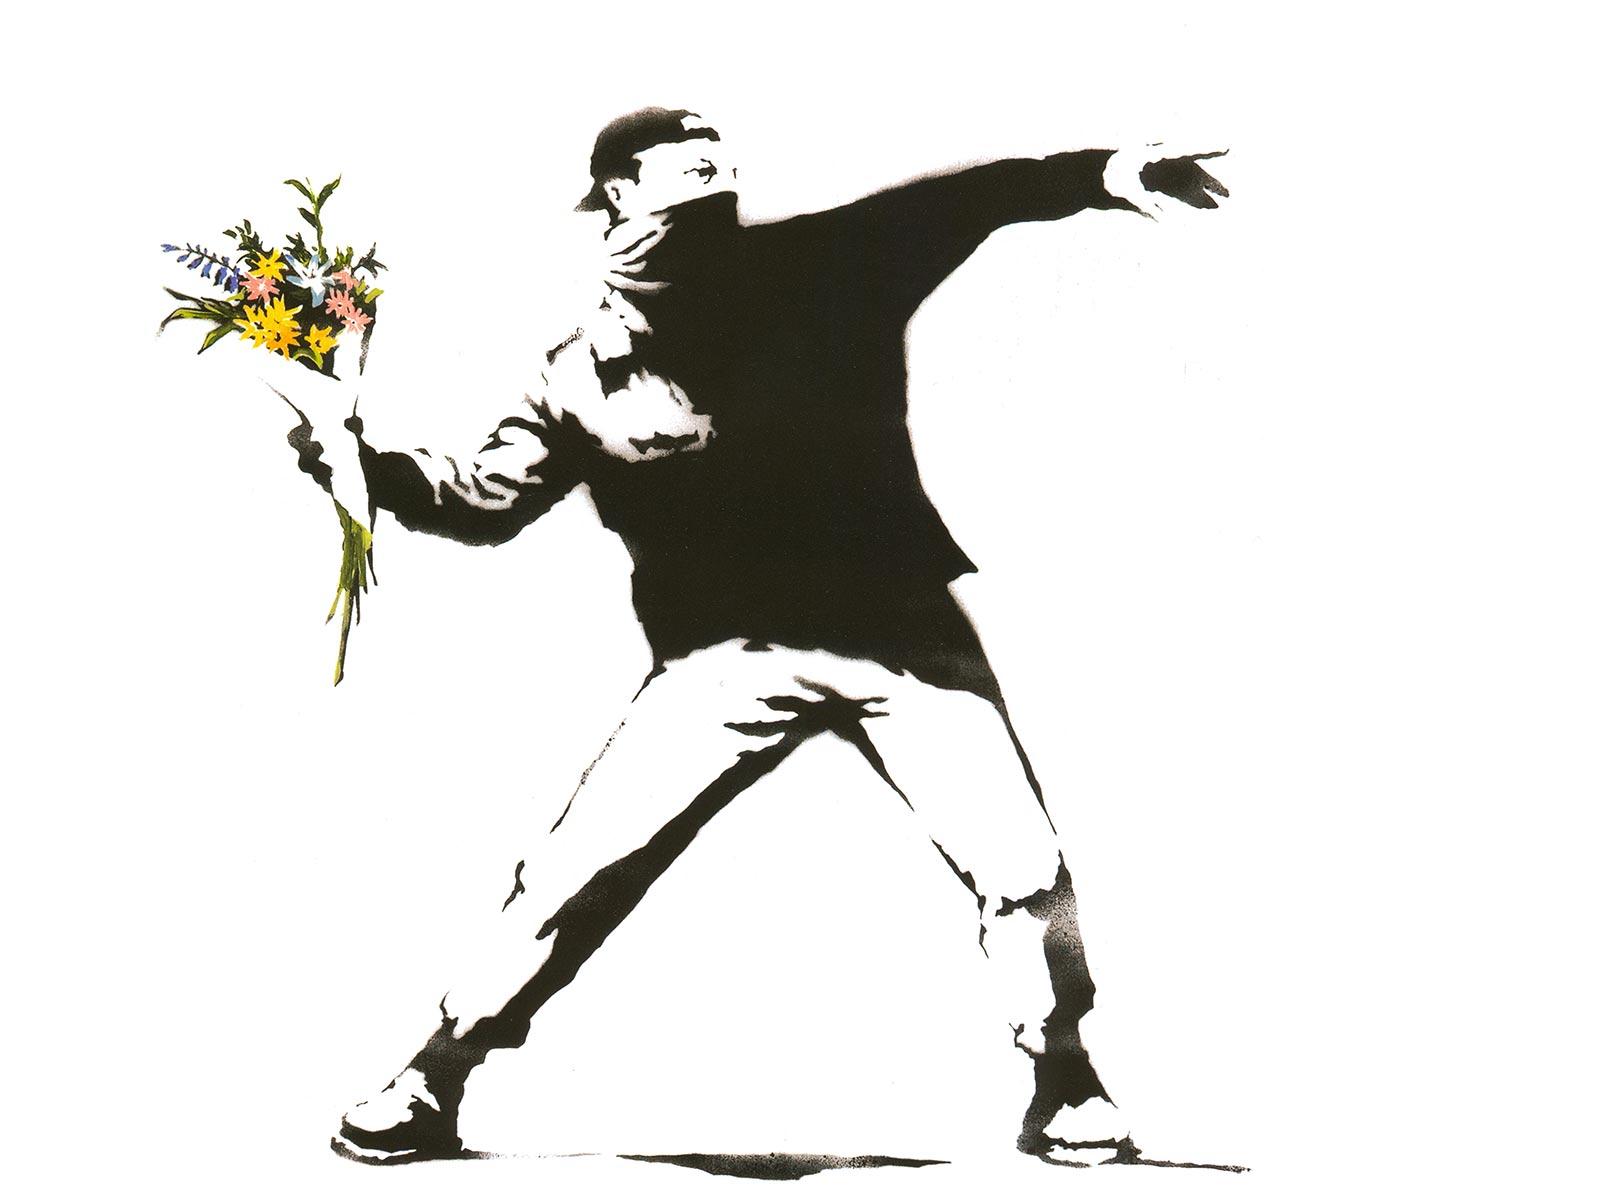 banksy-flower-thrower-92718